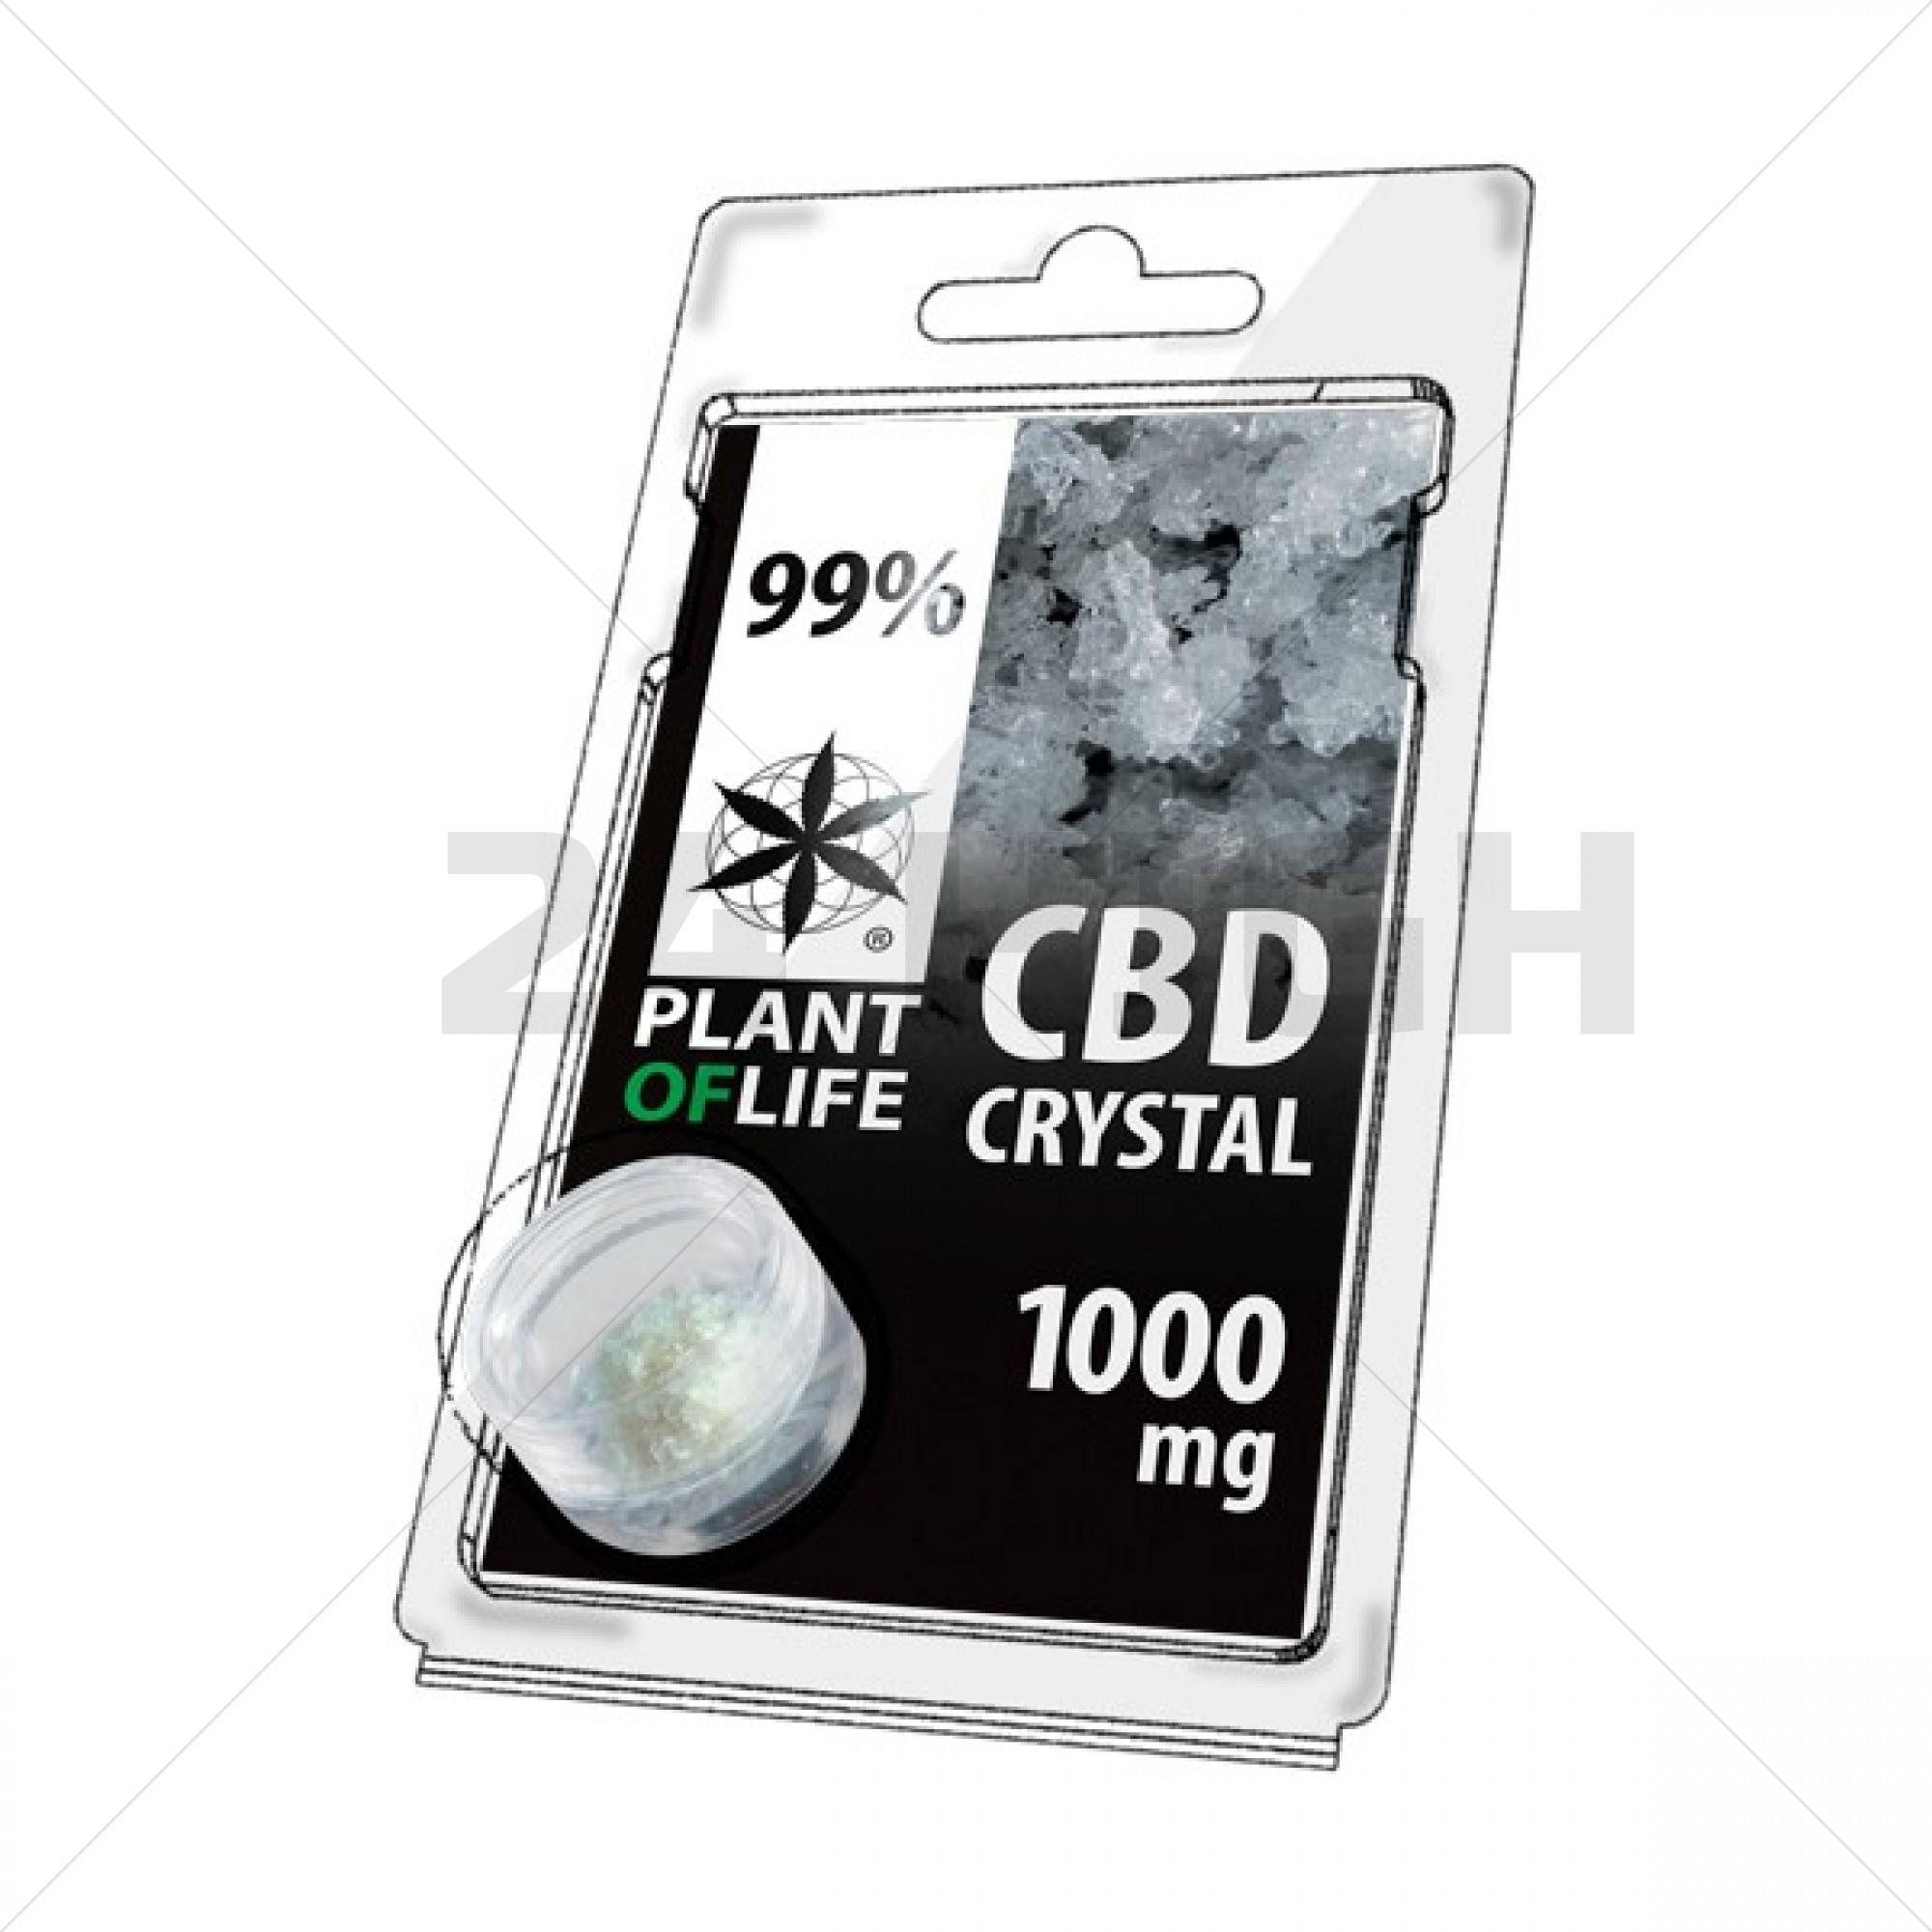 CBD Crystals 1000mg Plant Of Life